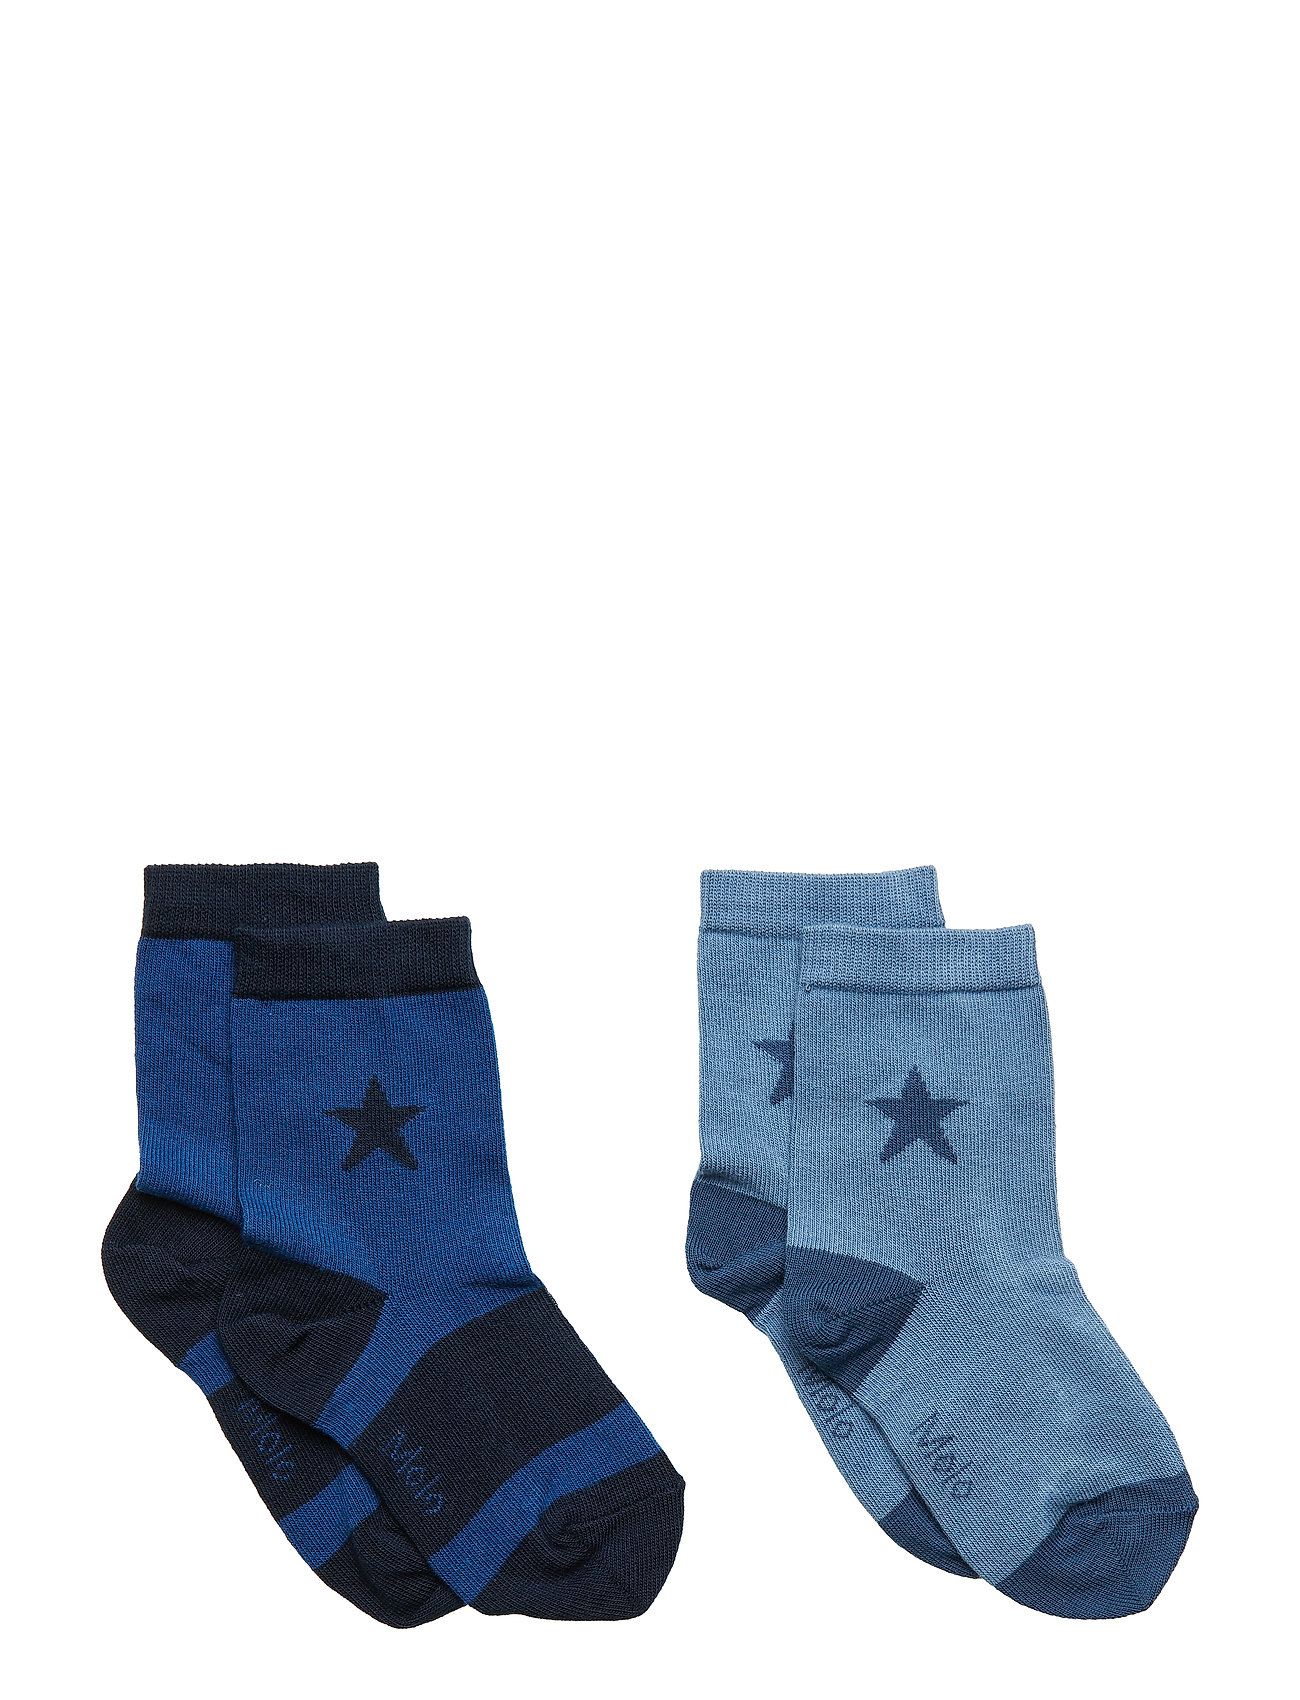 Molo Nitis - TWILIGHT BLUE